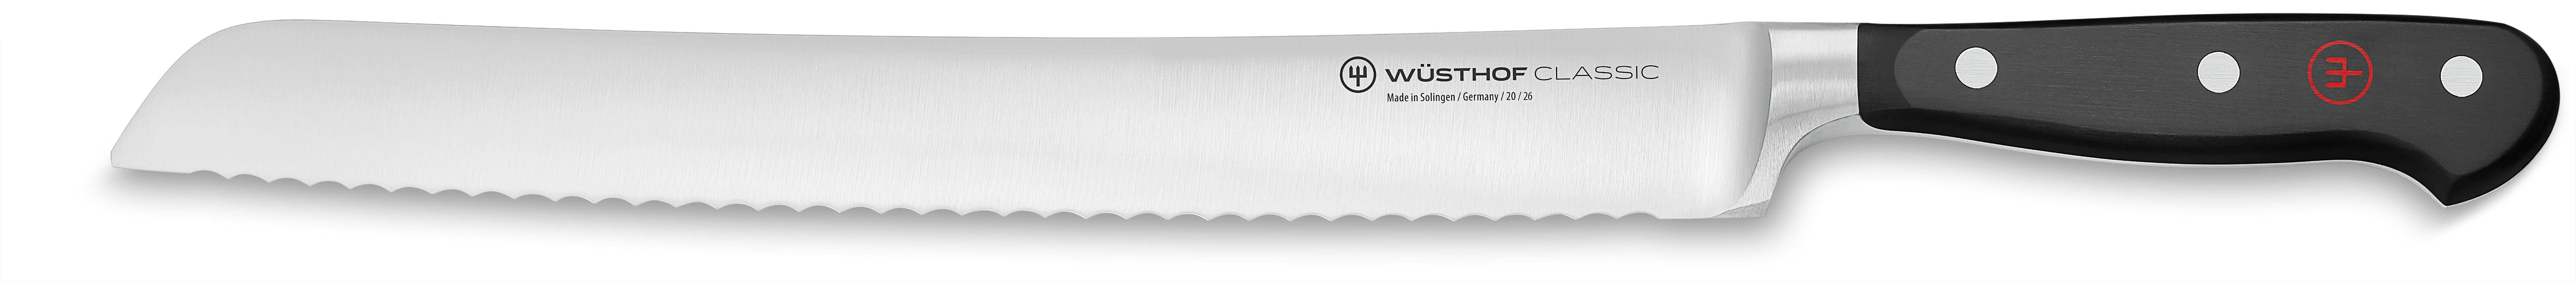 "Wusthof 4151-7 10"" Bread Knife - Serrated Edge, Full Tang, Forged"